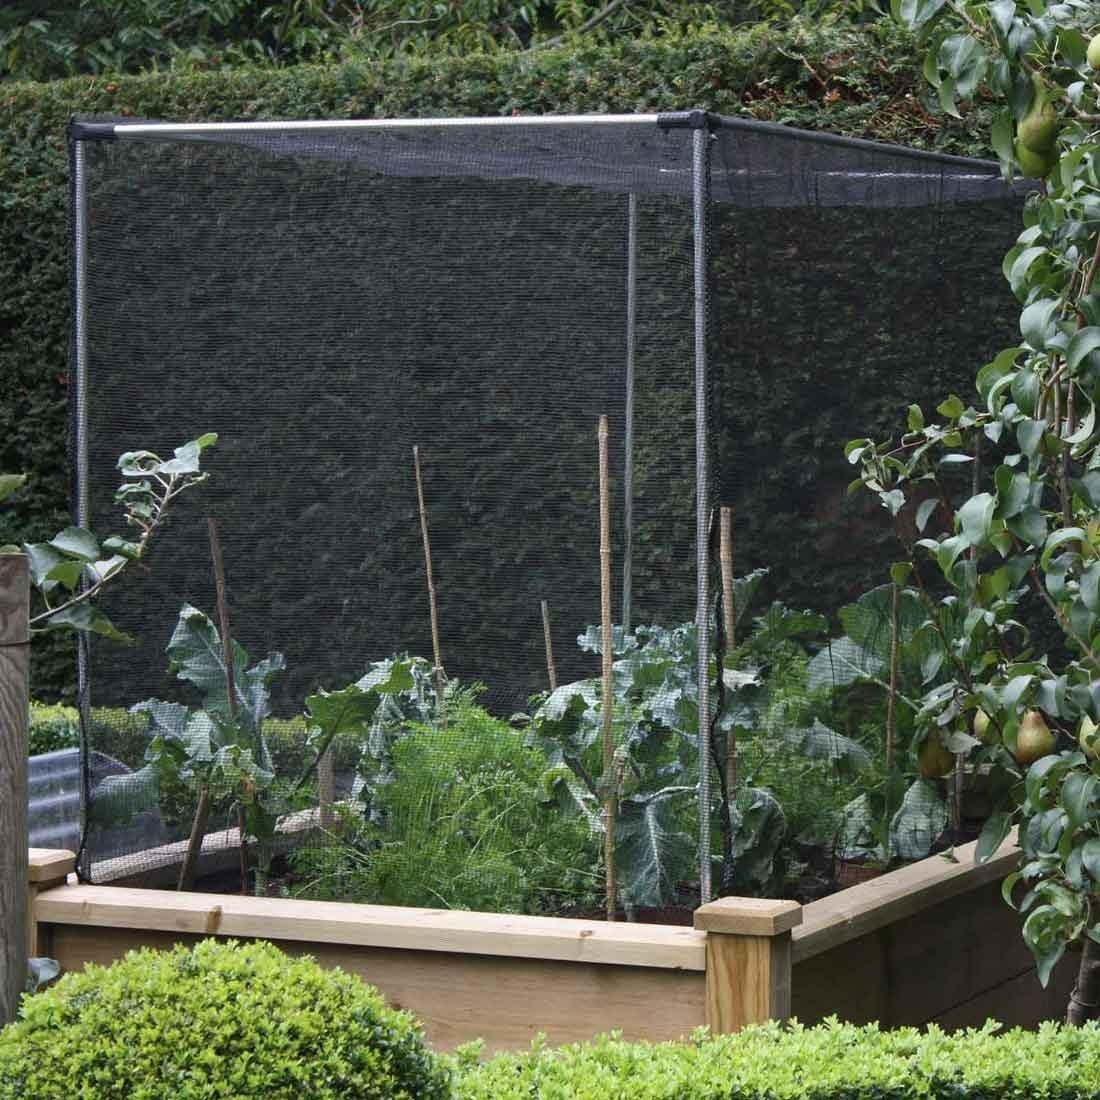 Raised Beds Garden Supplies At Harrod Horticultural